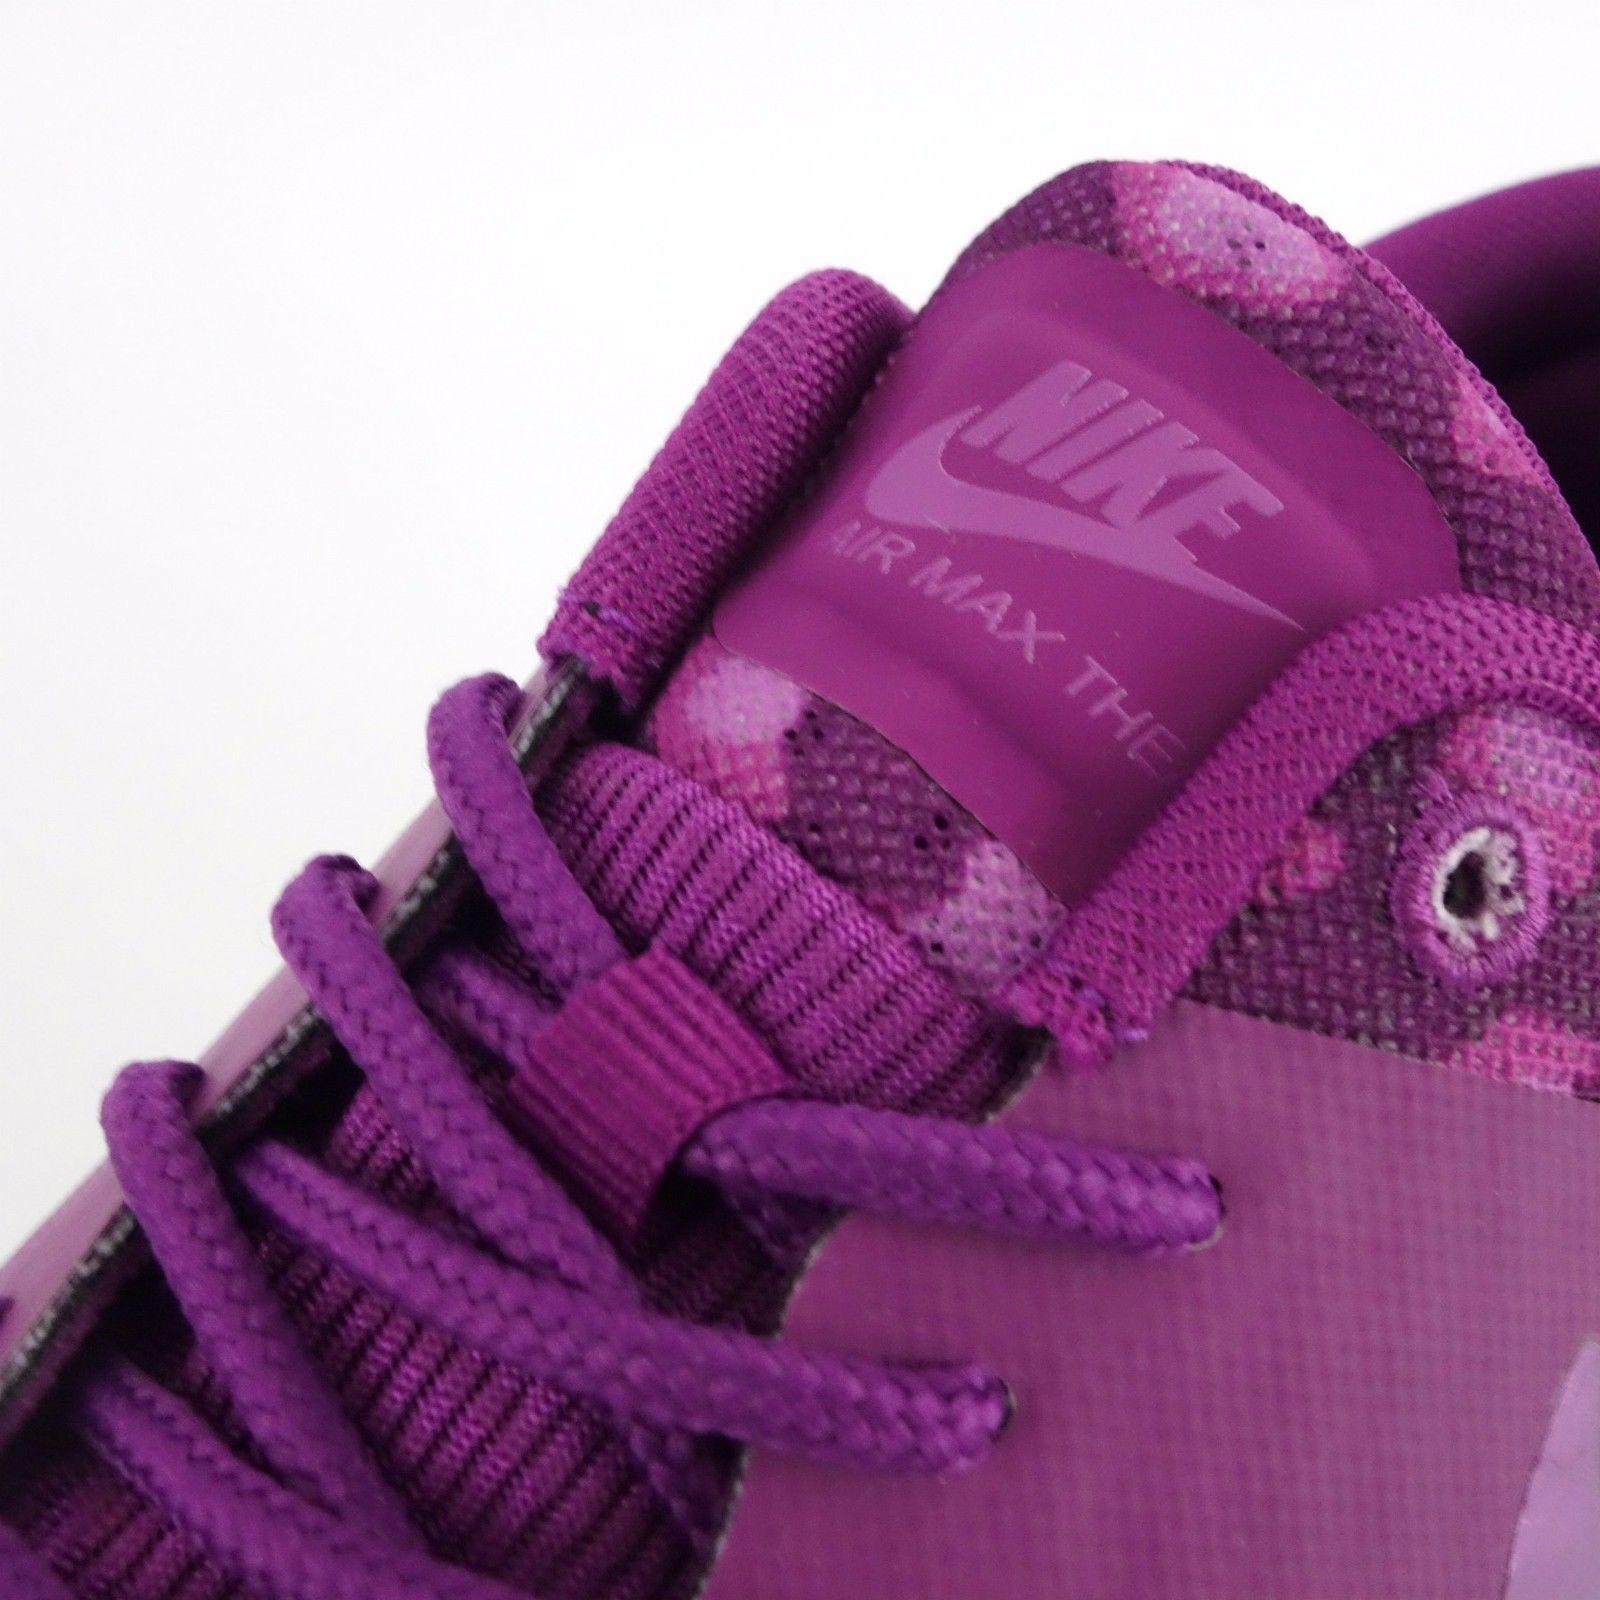 Nike Air Max Thea Print 599408 501 Berry Fuchsia Fuchsia Fuchsia Flash Fuchsia Glow Wmn Sz 7 b5b169